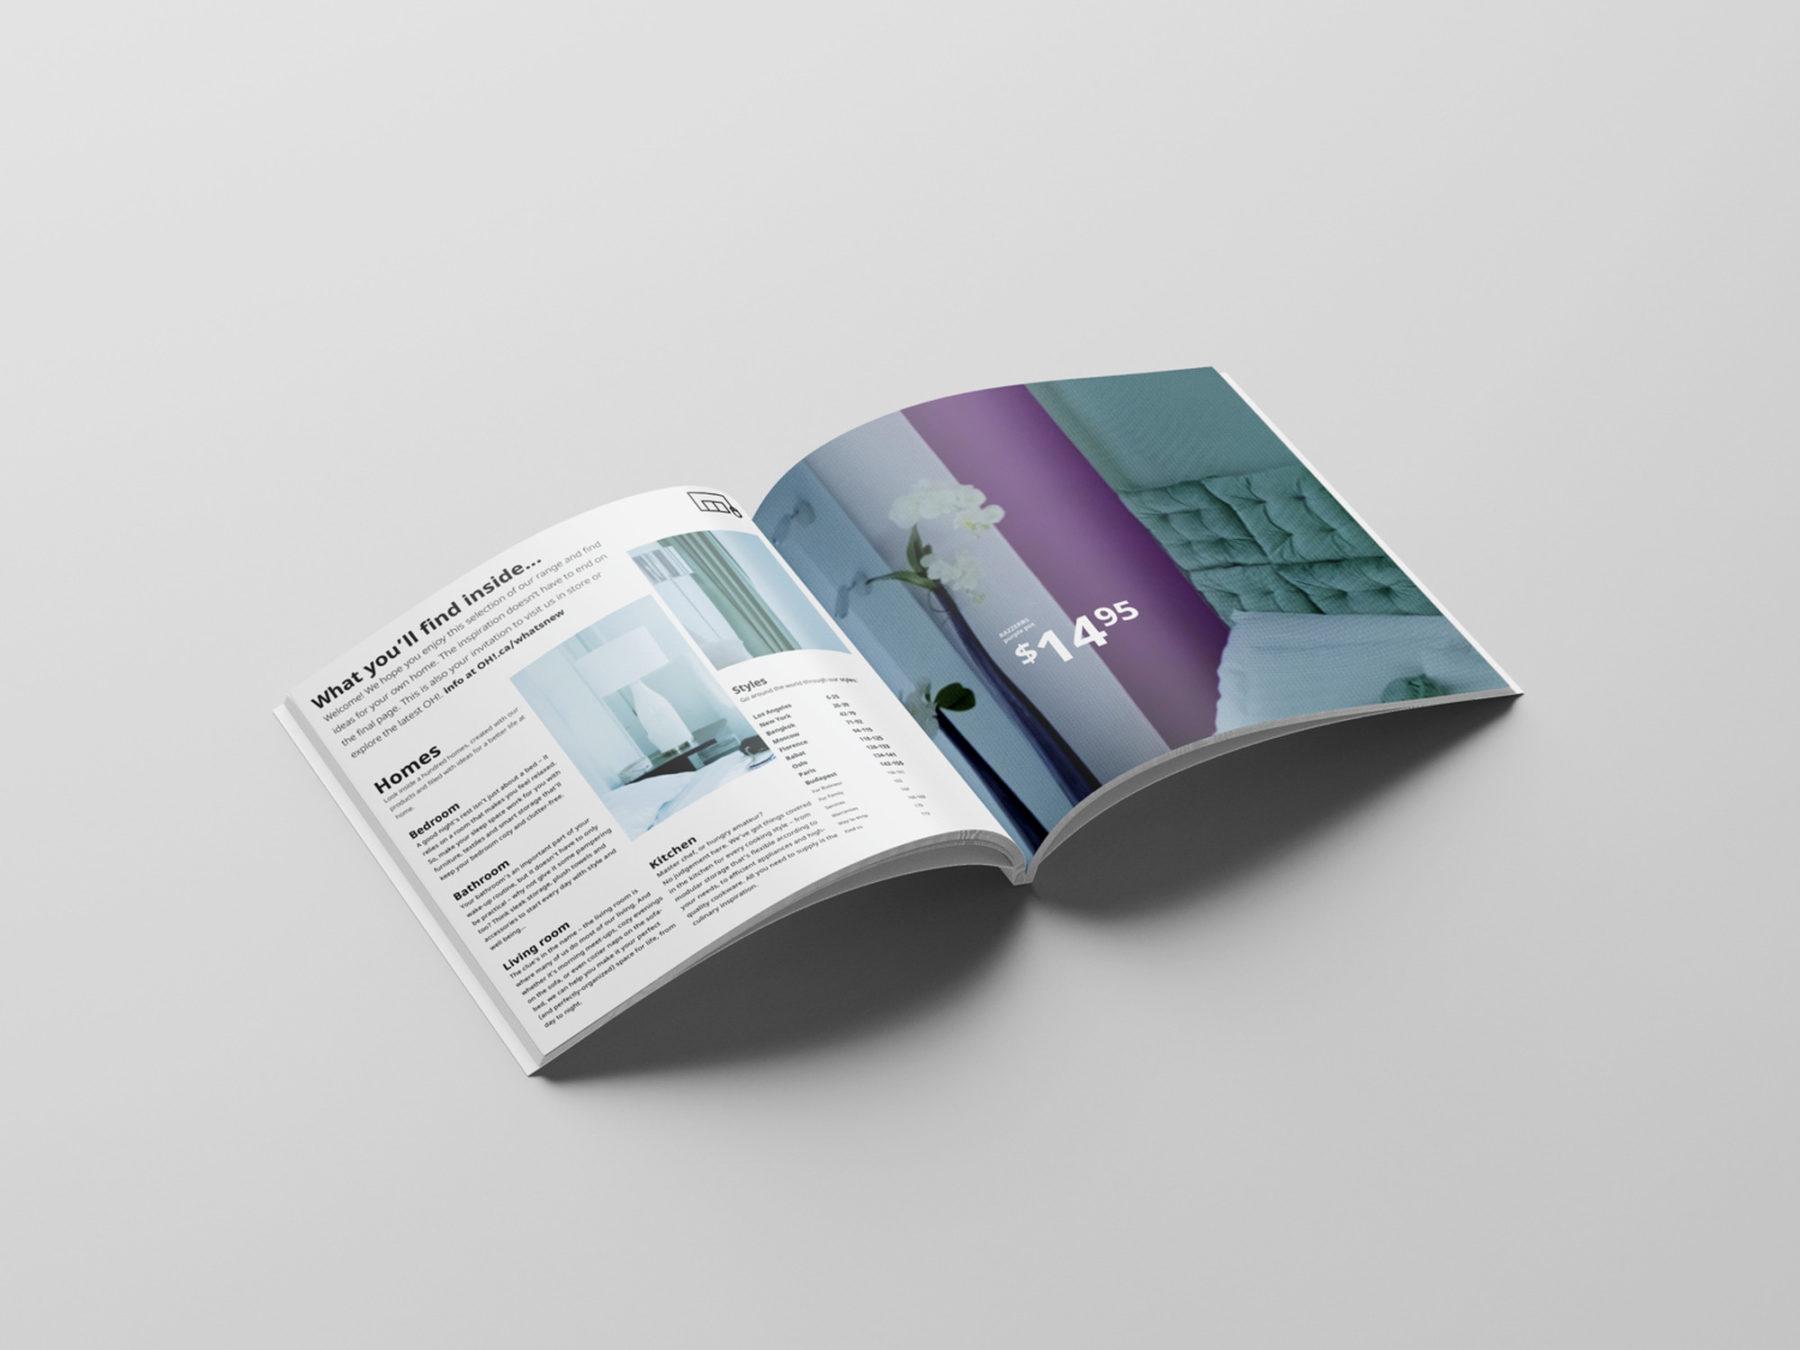 abel picogna oh Perfect Binding Brochure Mockup 1